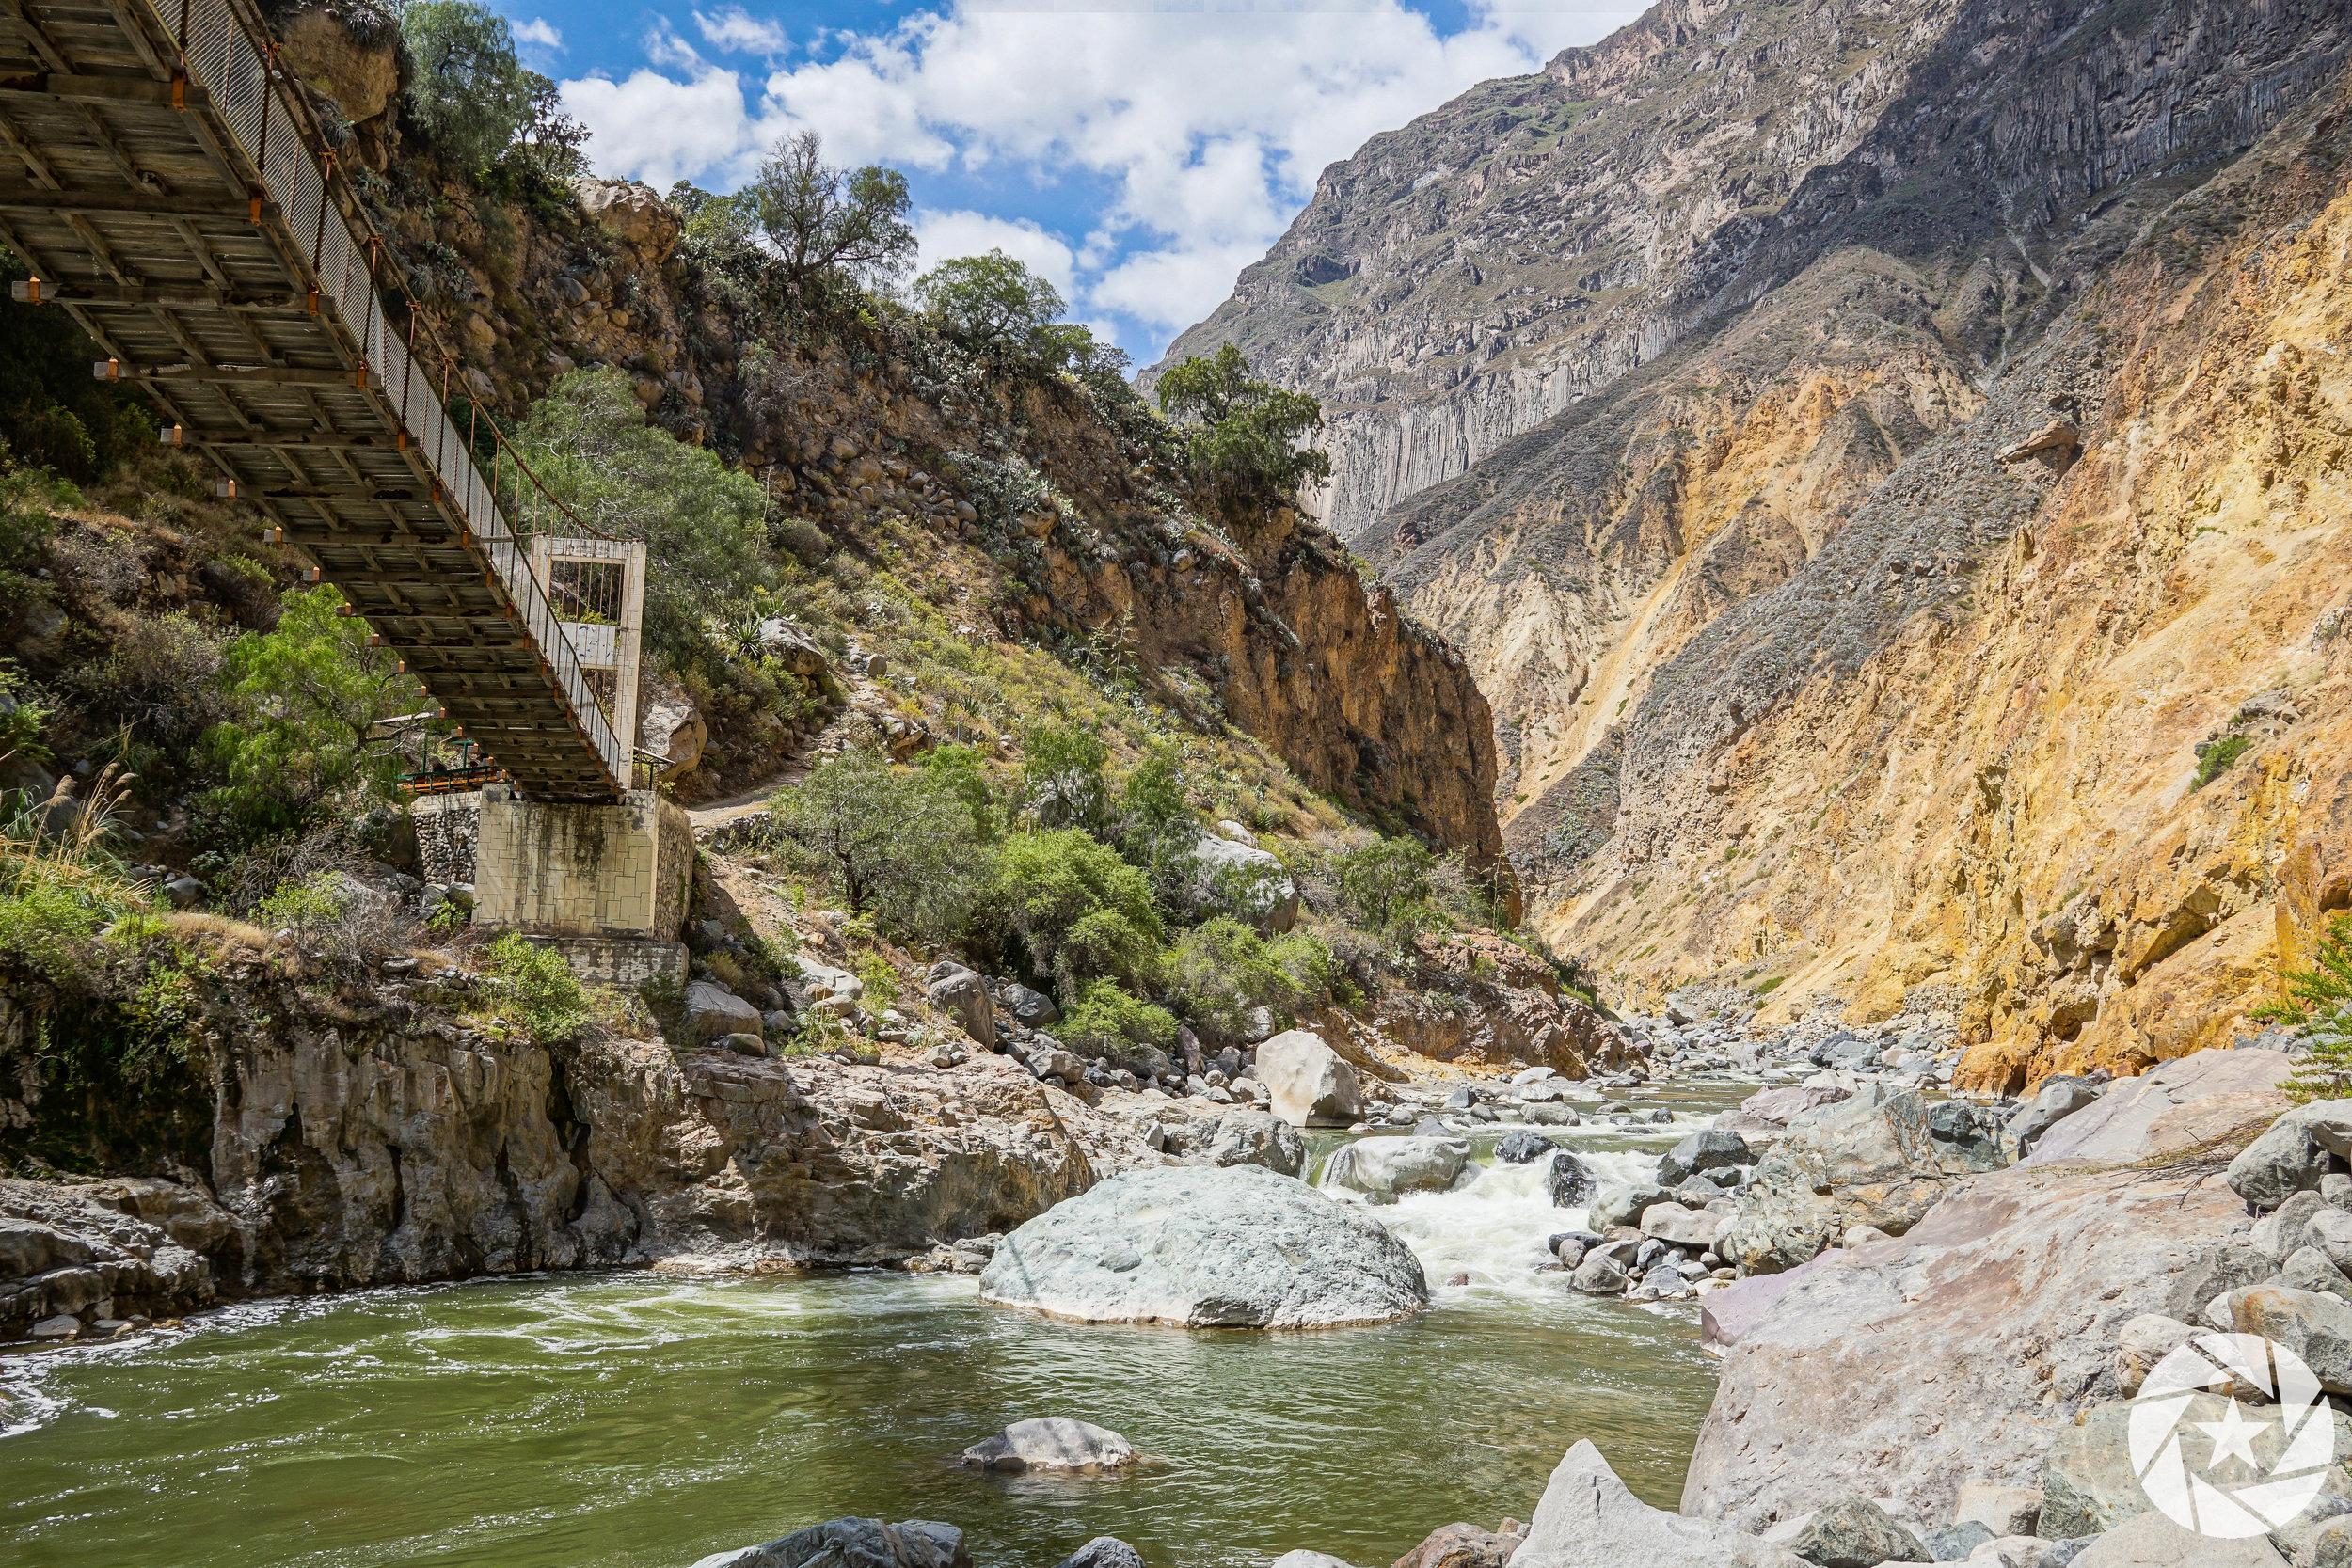 Hiking Colca Canyon near Arequipa, Peru